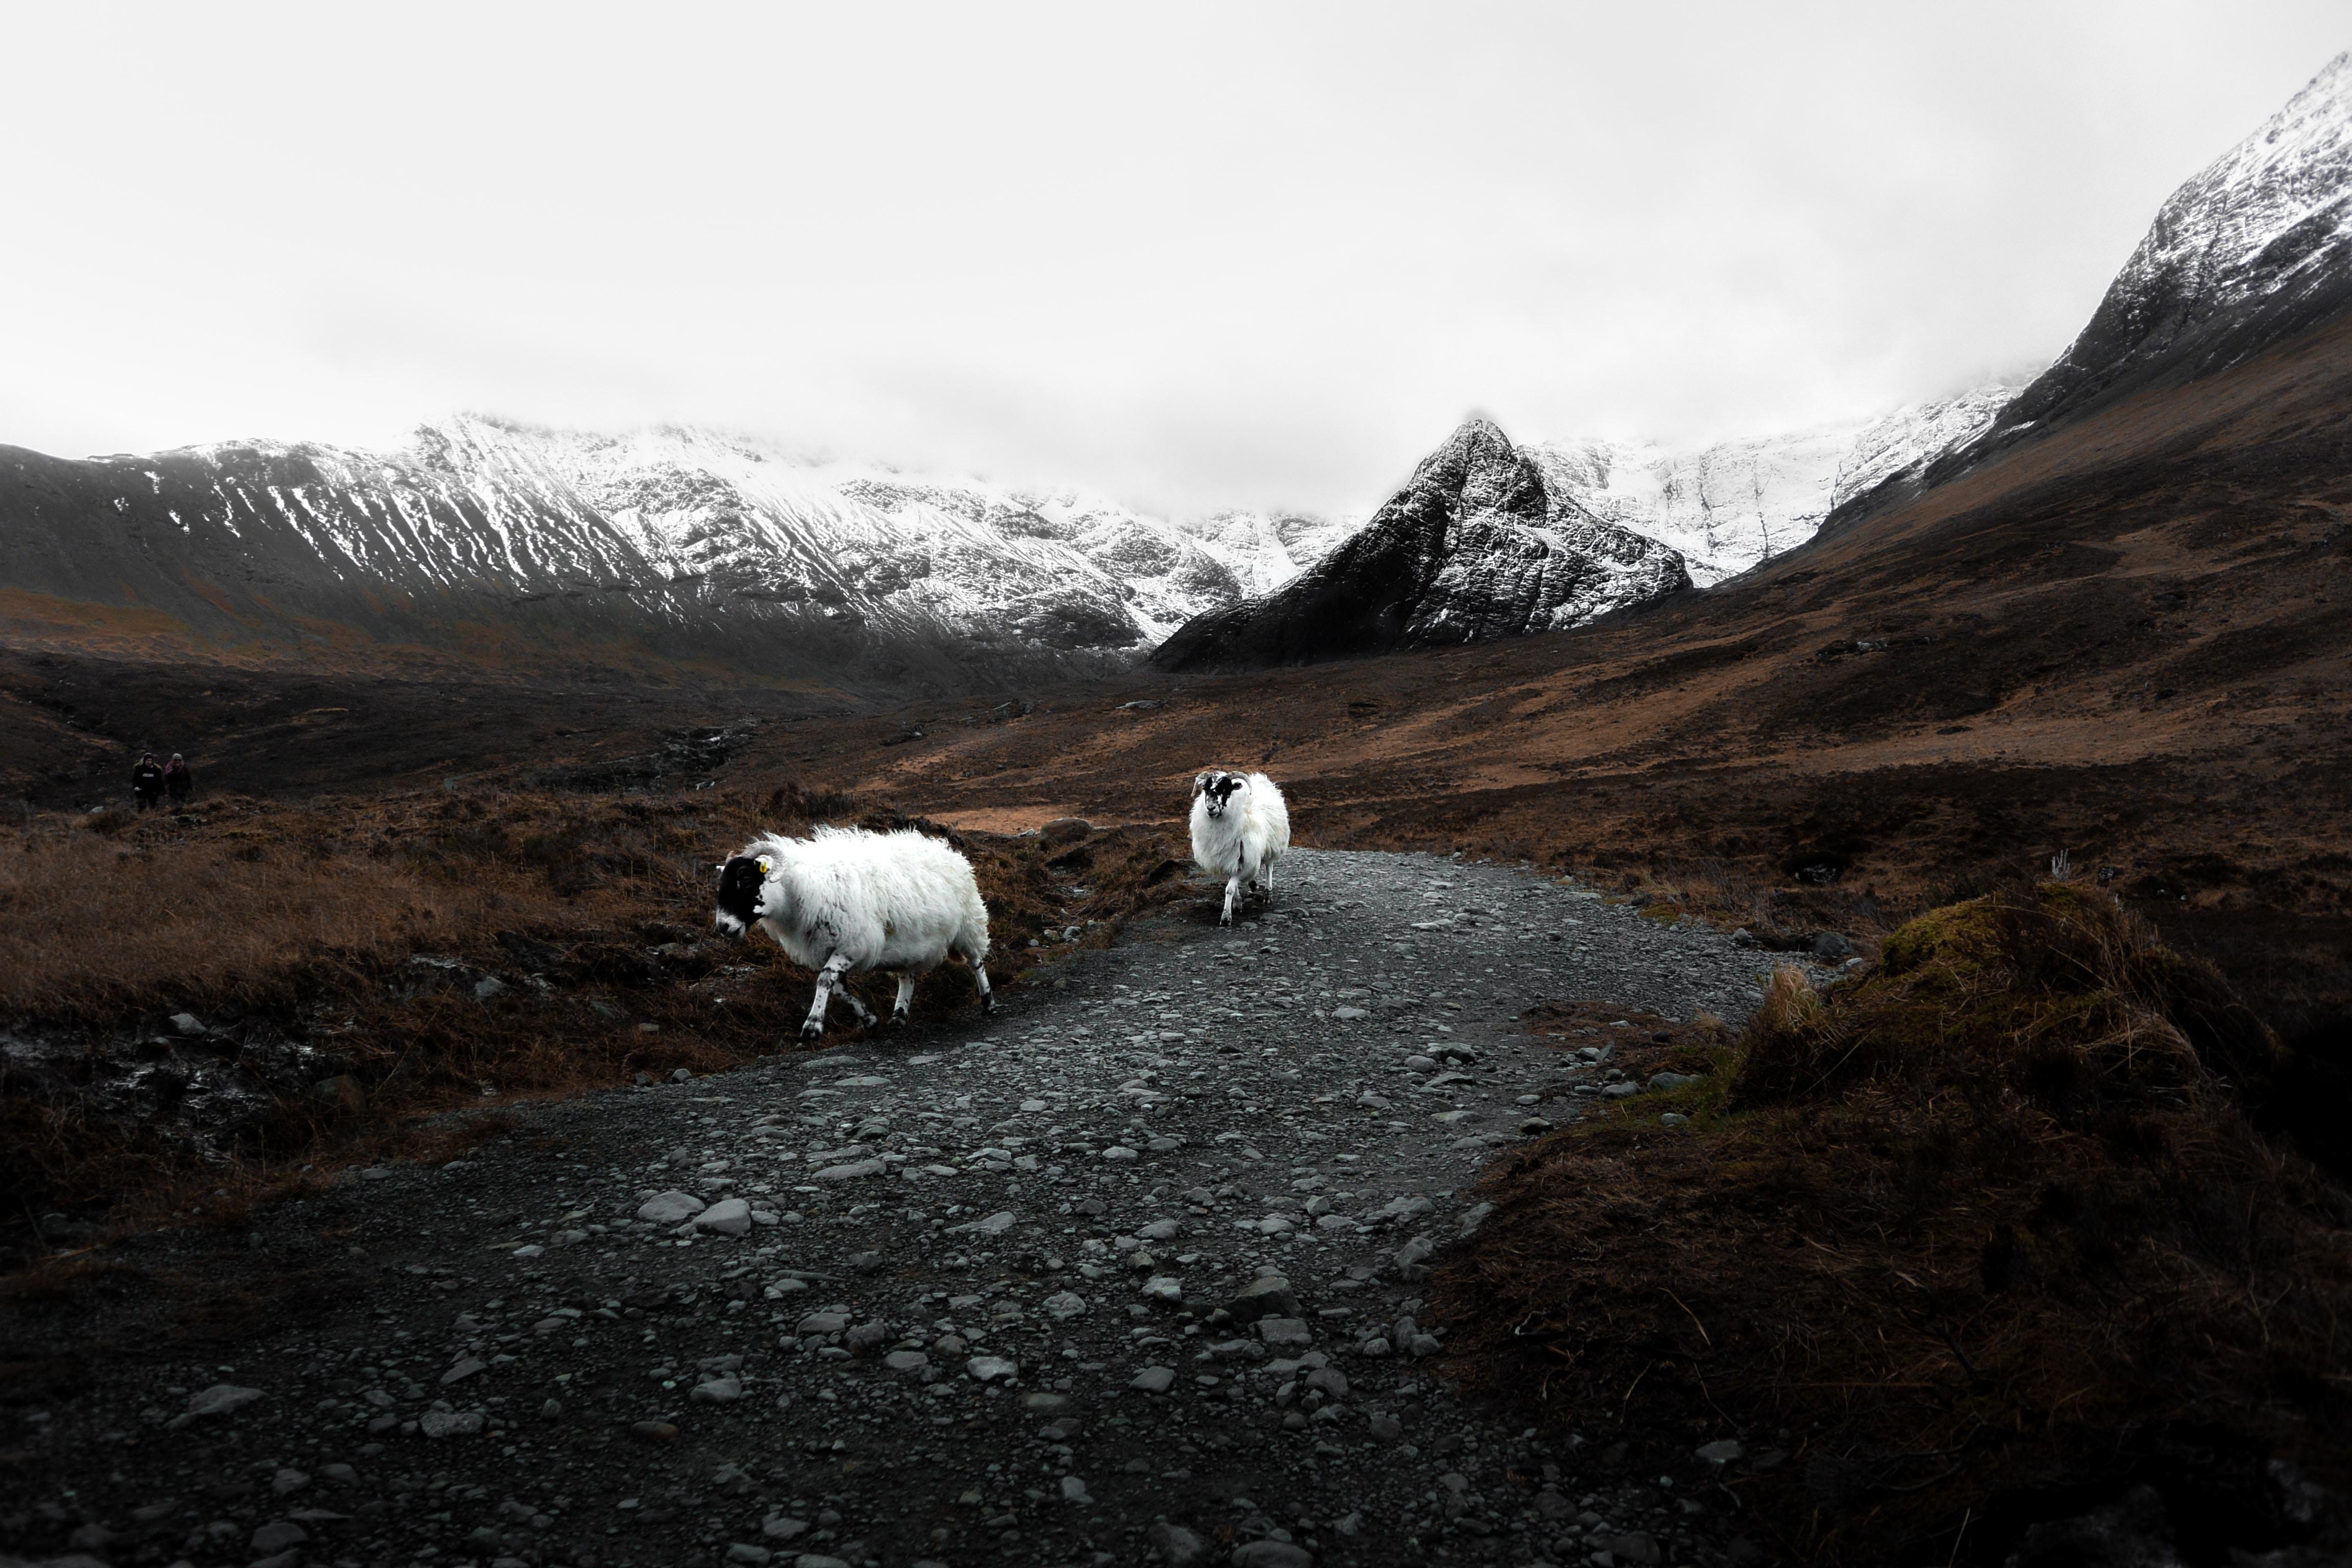 two white sheeps walking near snow-capped mountains